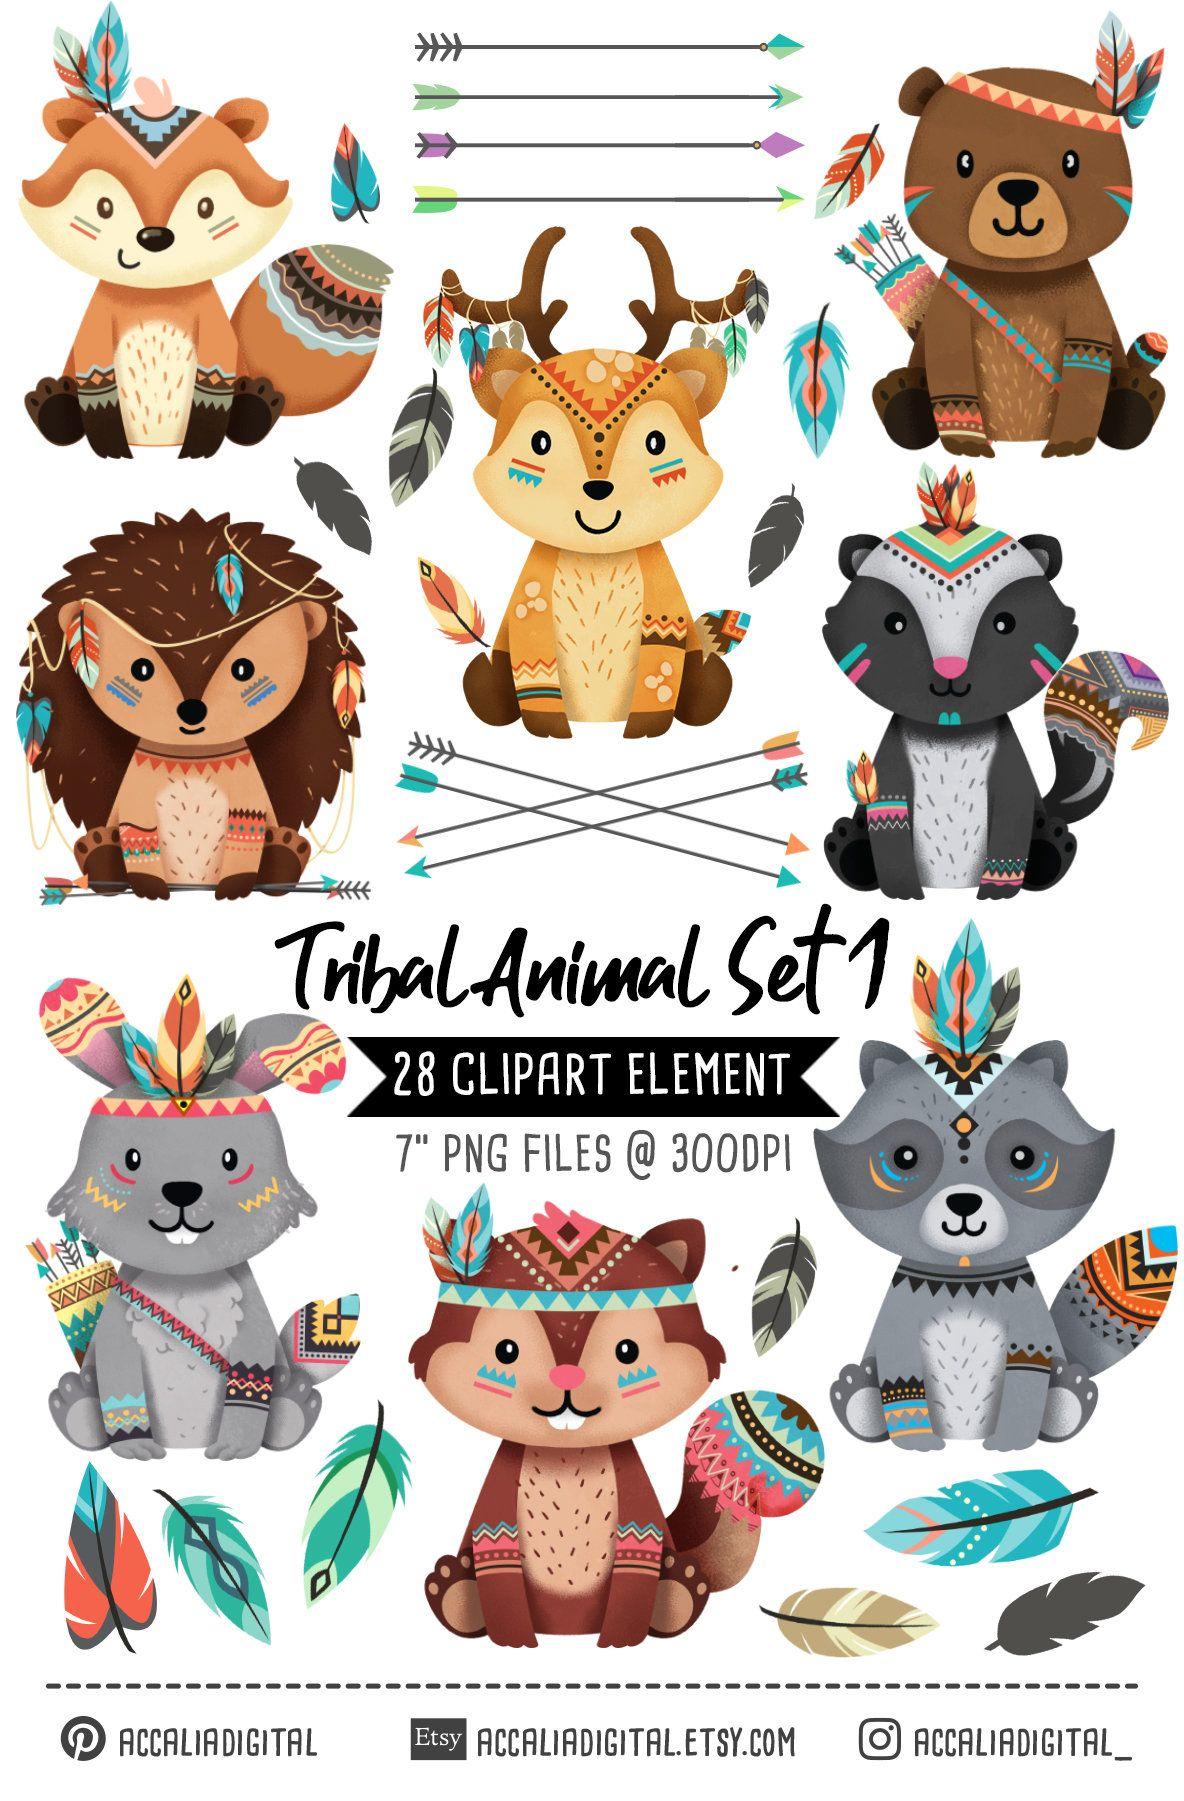 Woodland animals Clipart set 1, Tribal animal clip art